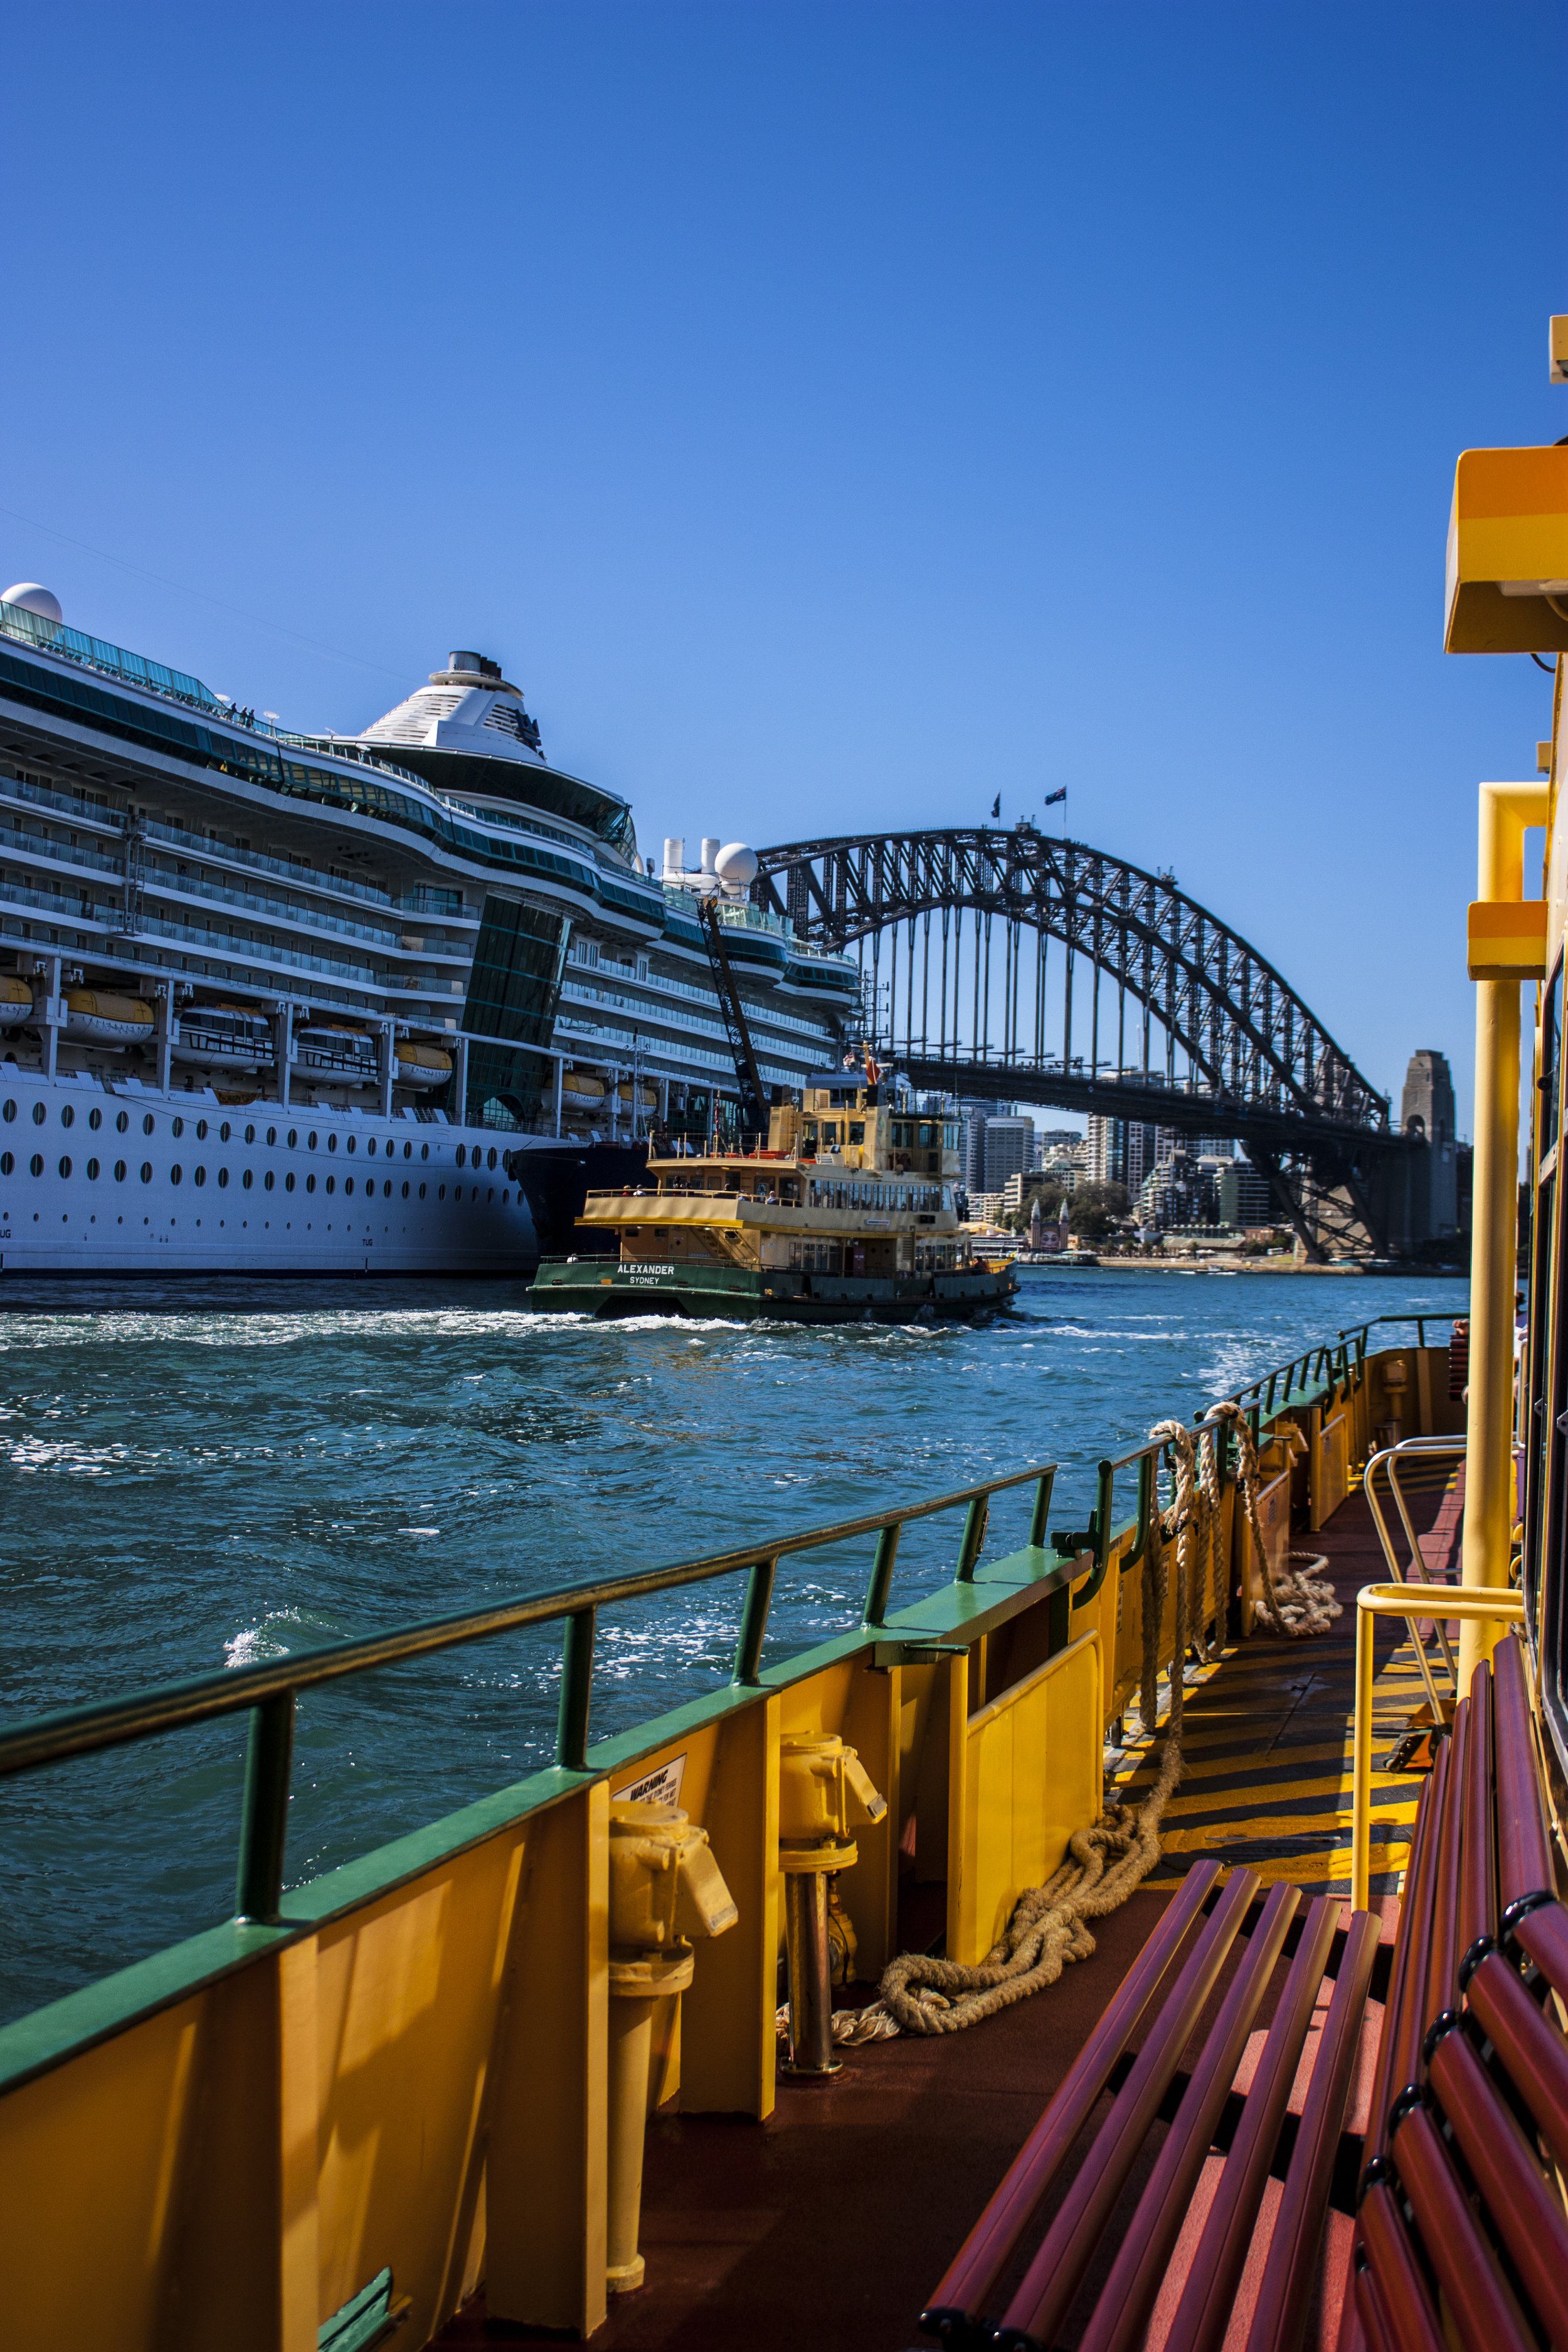 Australia_Sydney_Sydney Harbor Bridge From Water Taxi.jpg